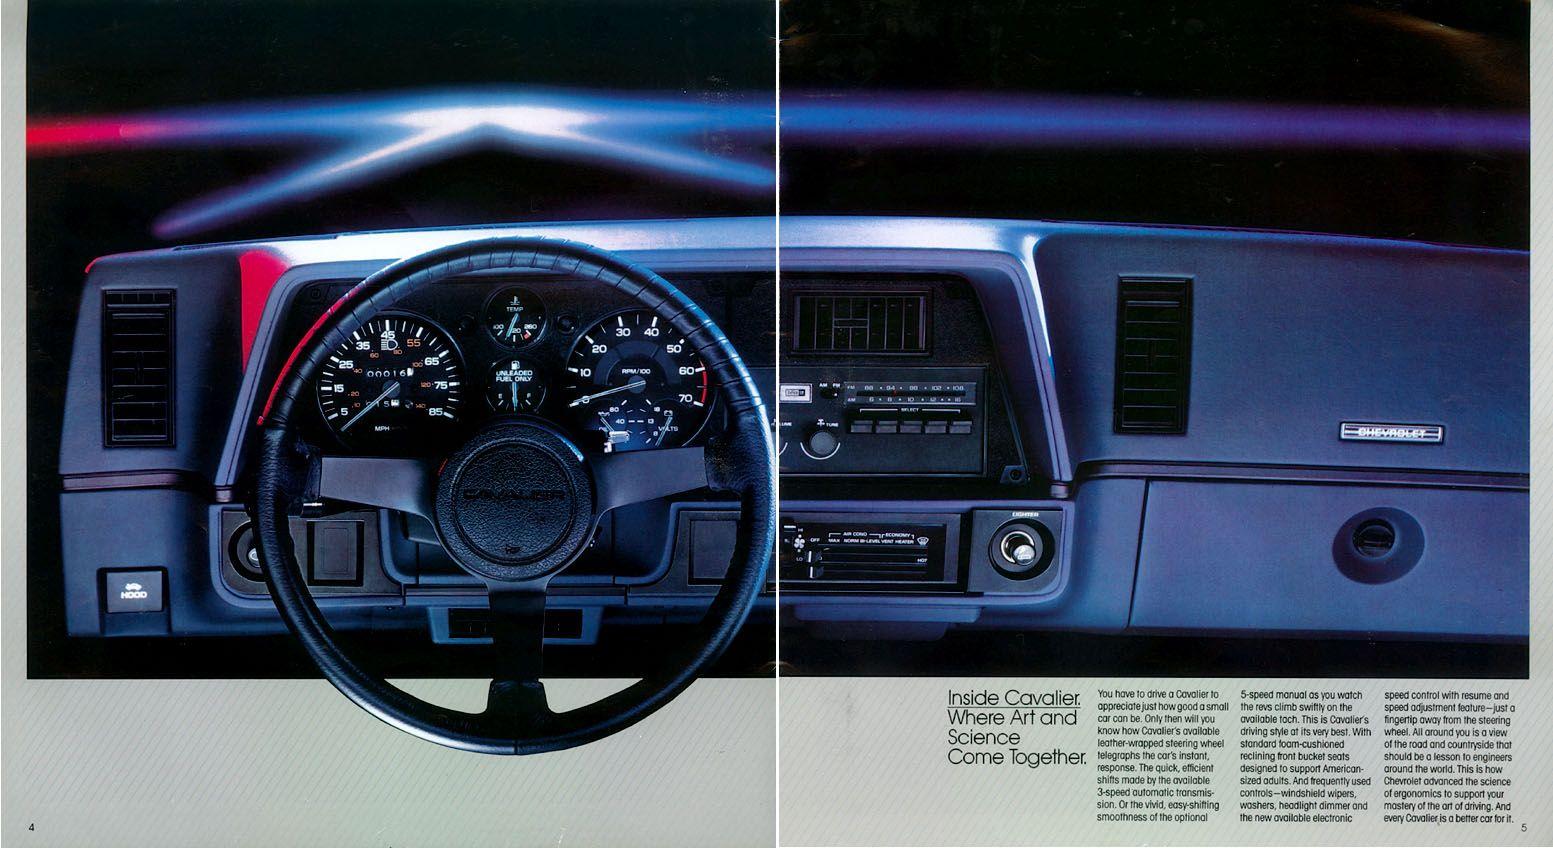 1984 Chevrolet Cavalier-03 | Cars | Pinterest | Chevrolet and Cars